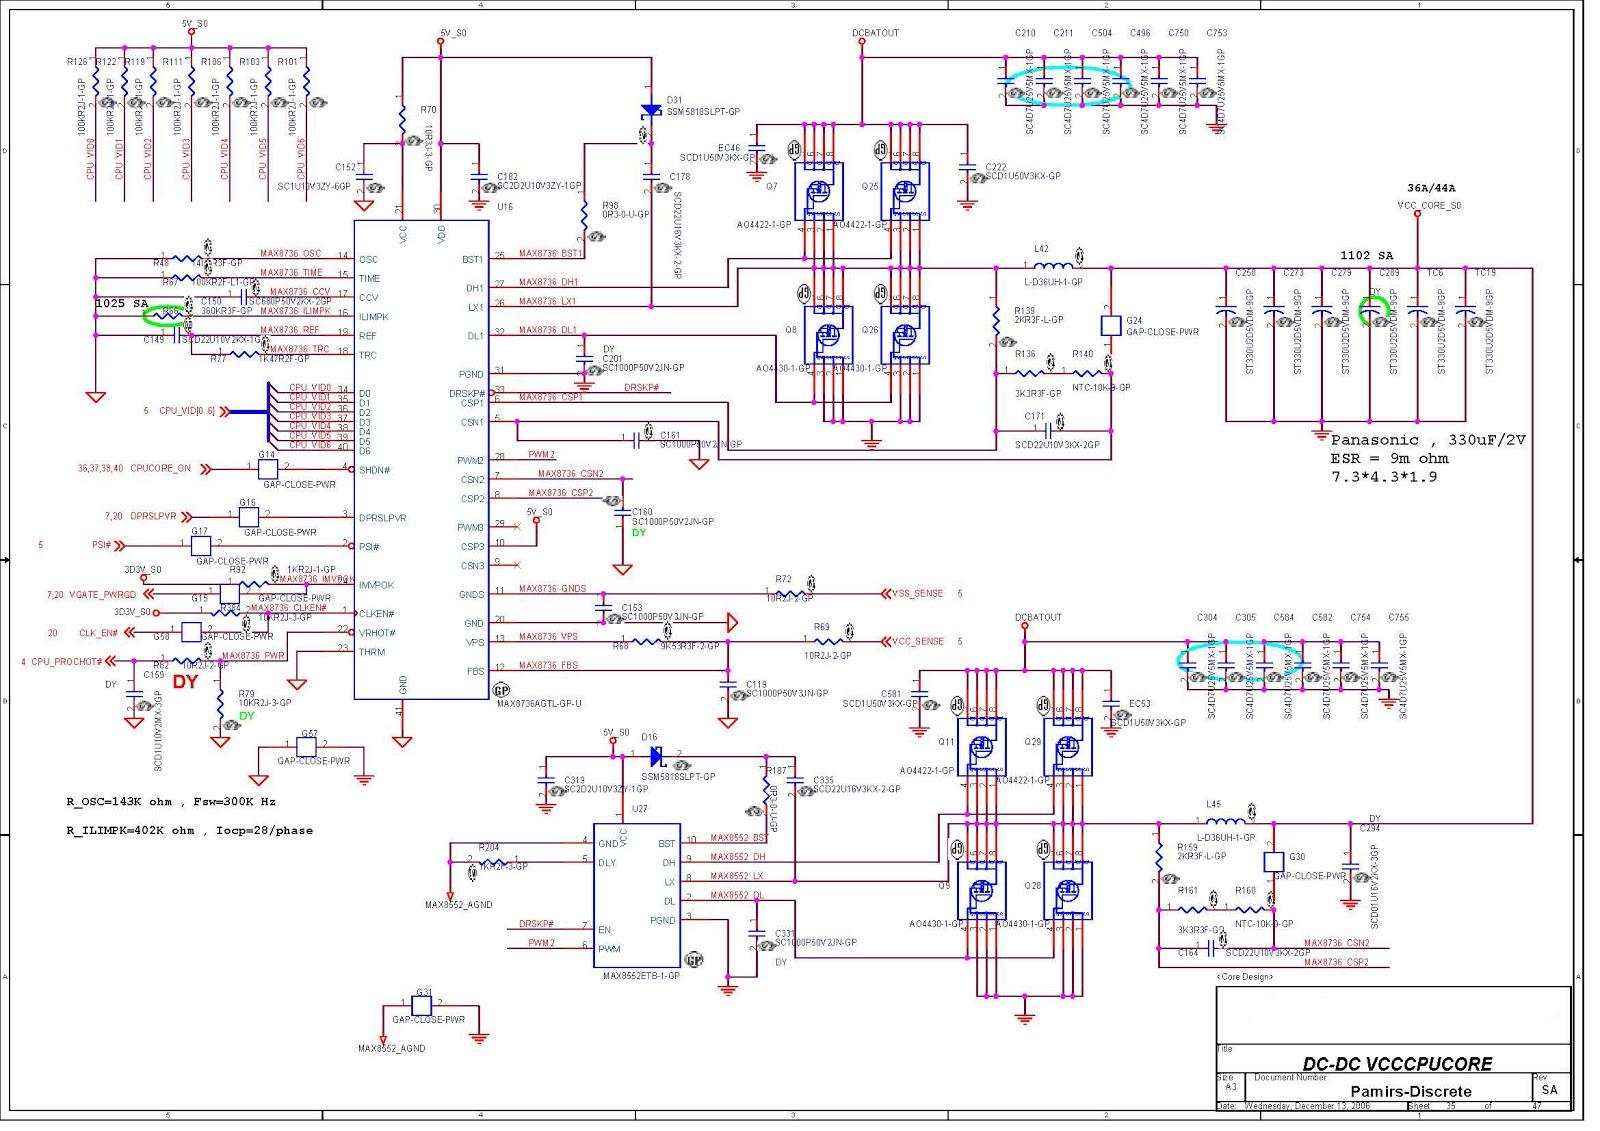 Diagram Hp 2000 Laptop Diagram Full Version Hd Quality Laptop Diagram Milsdiagram Associazionedamo It